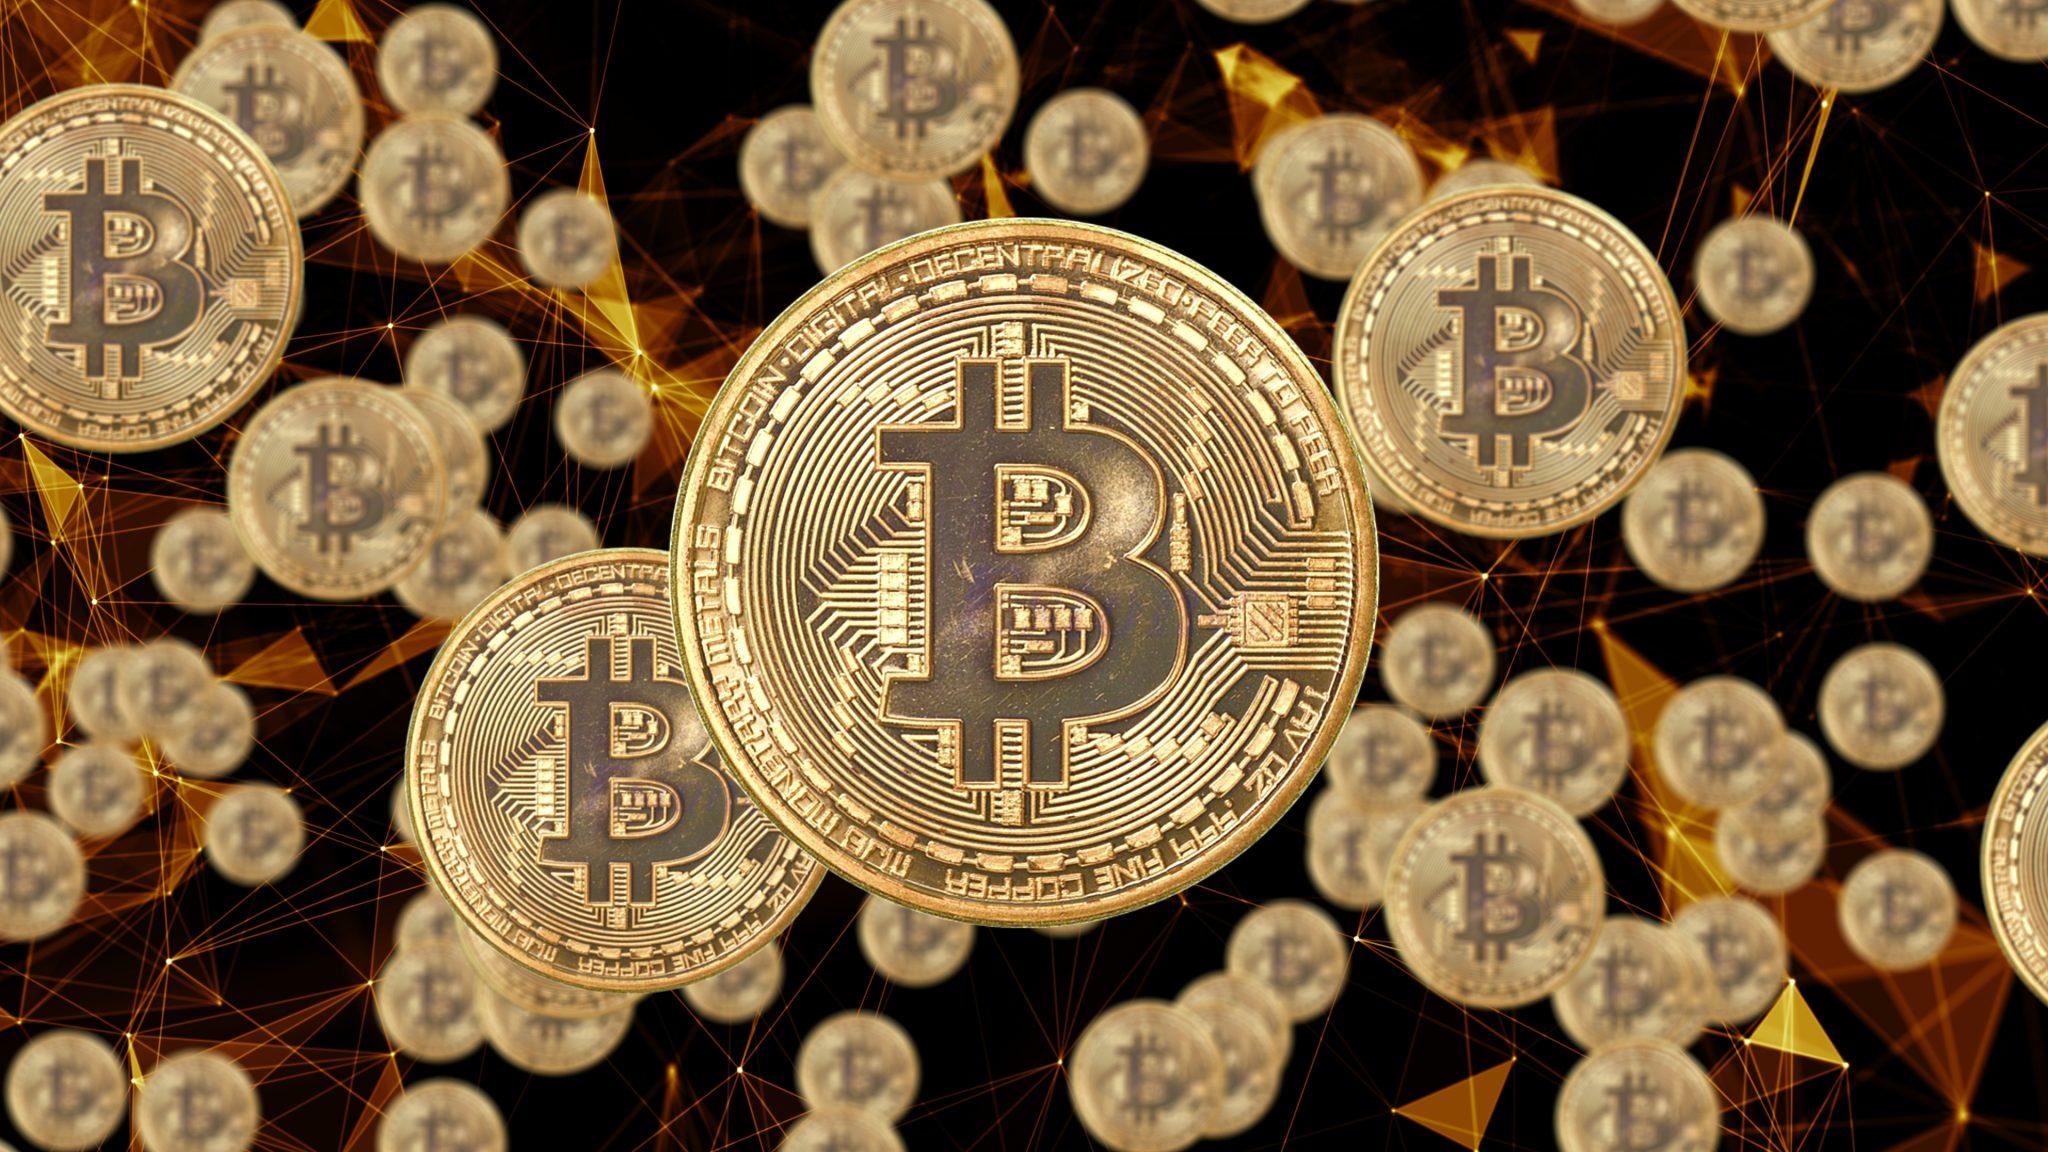 2048 bitcoins caeneus mining bitcoins